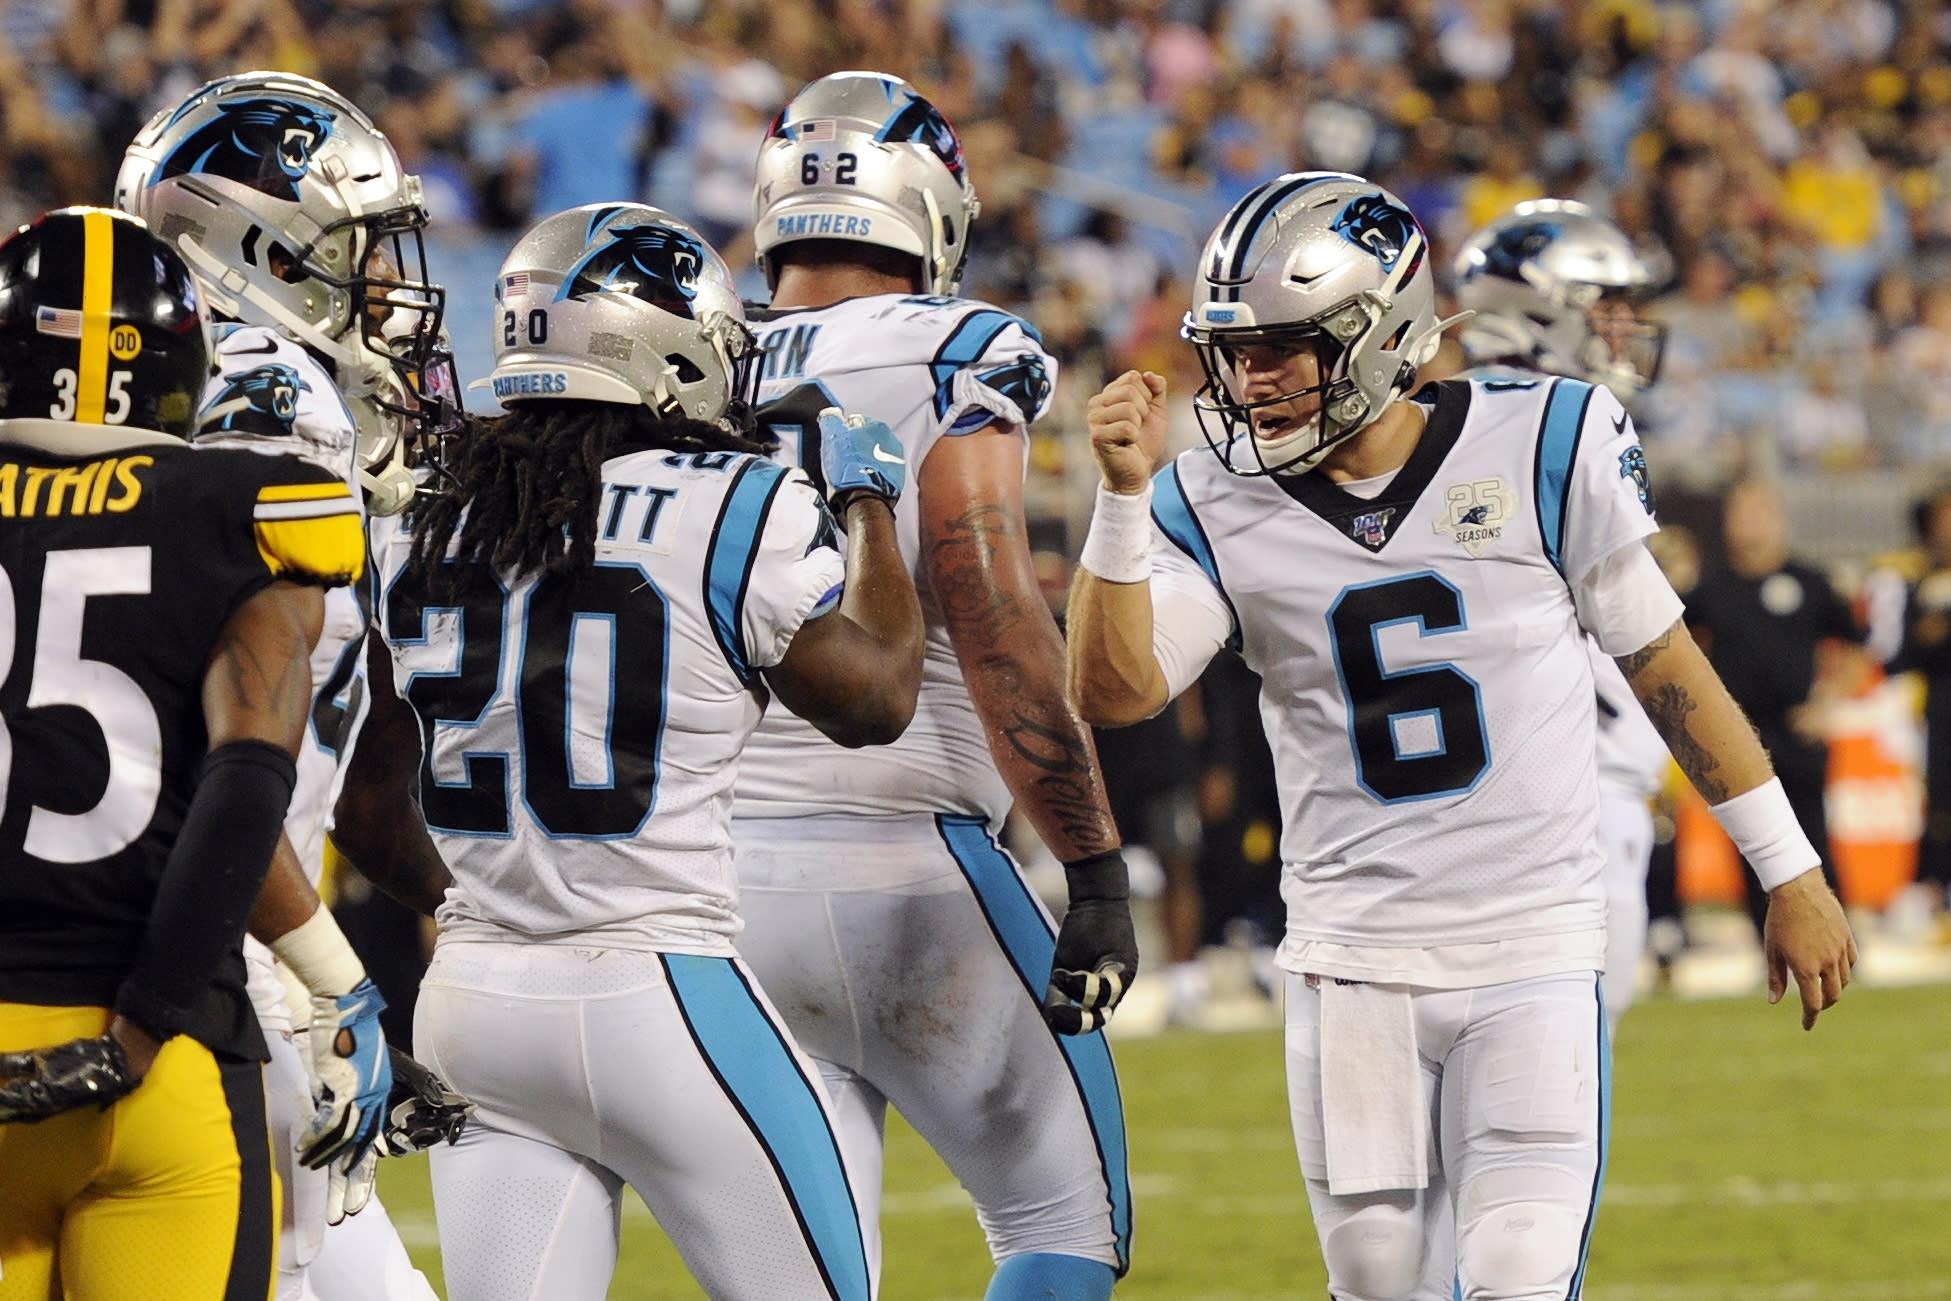 Panthers place K Gano on IR, cut QB Heinicke, RB Artis-Payne